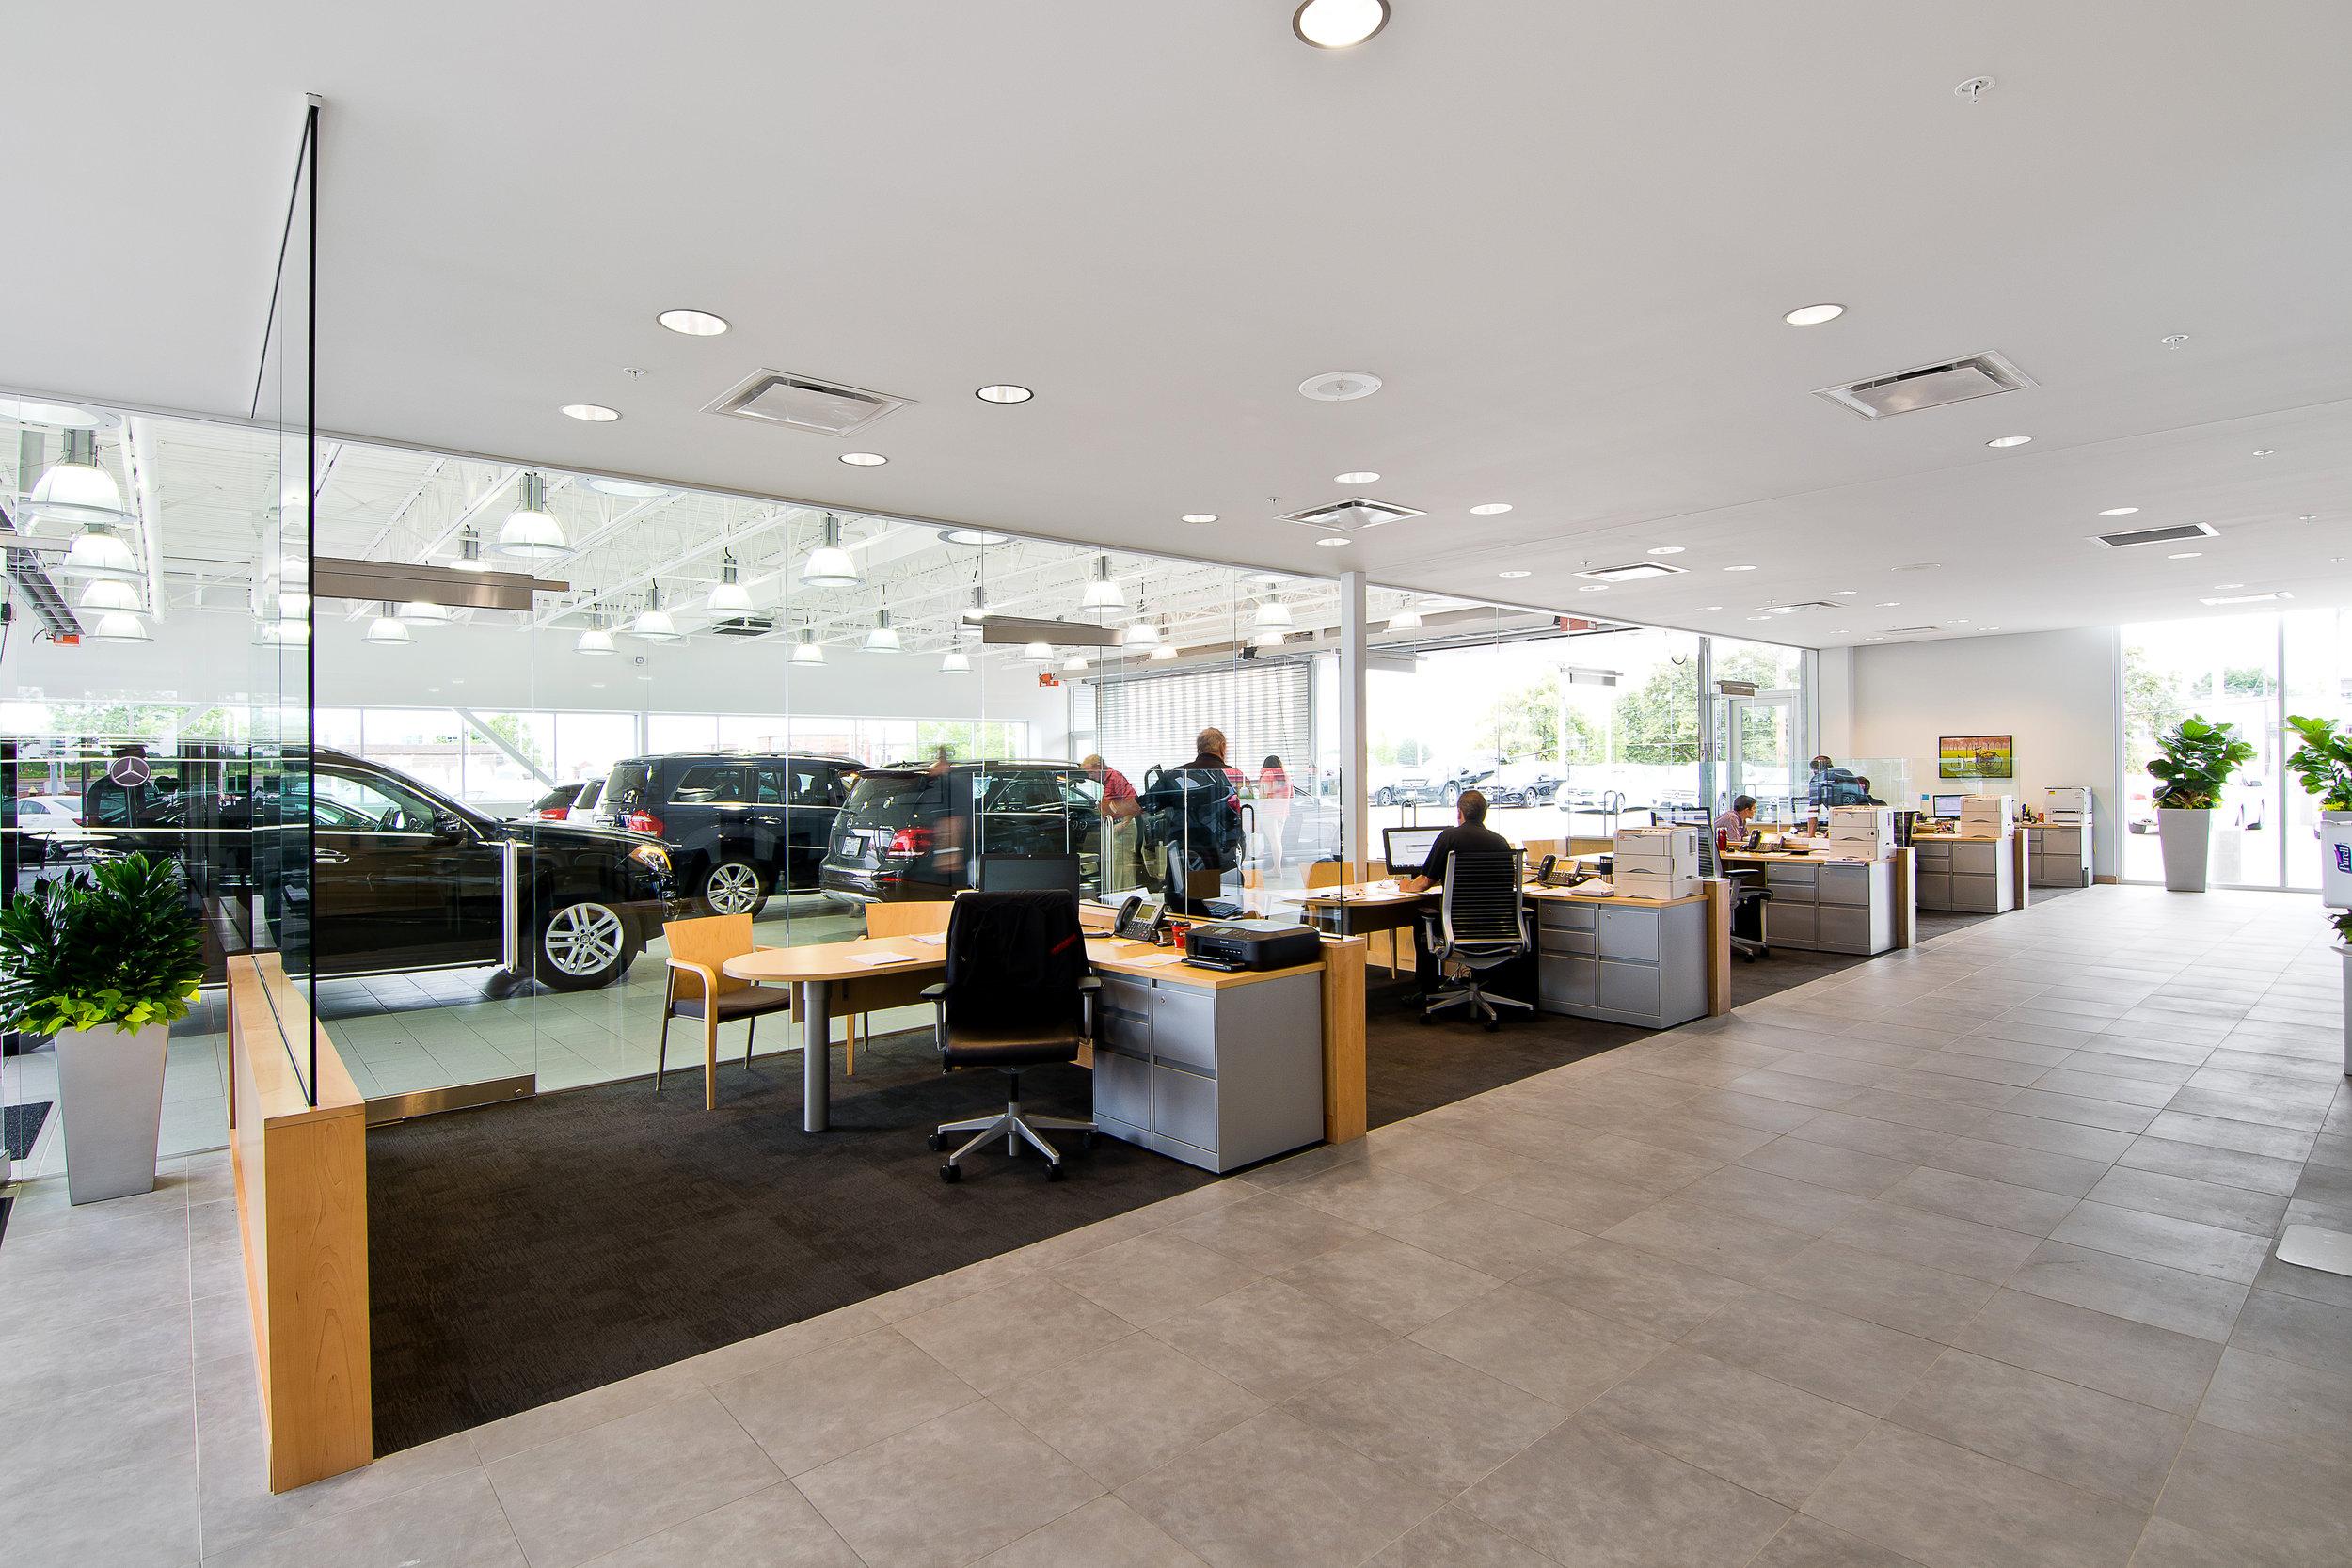 Mercedes Benz - STL (6 of 28).jpg